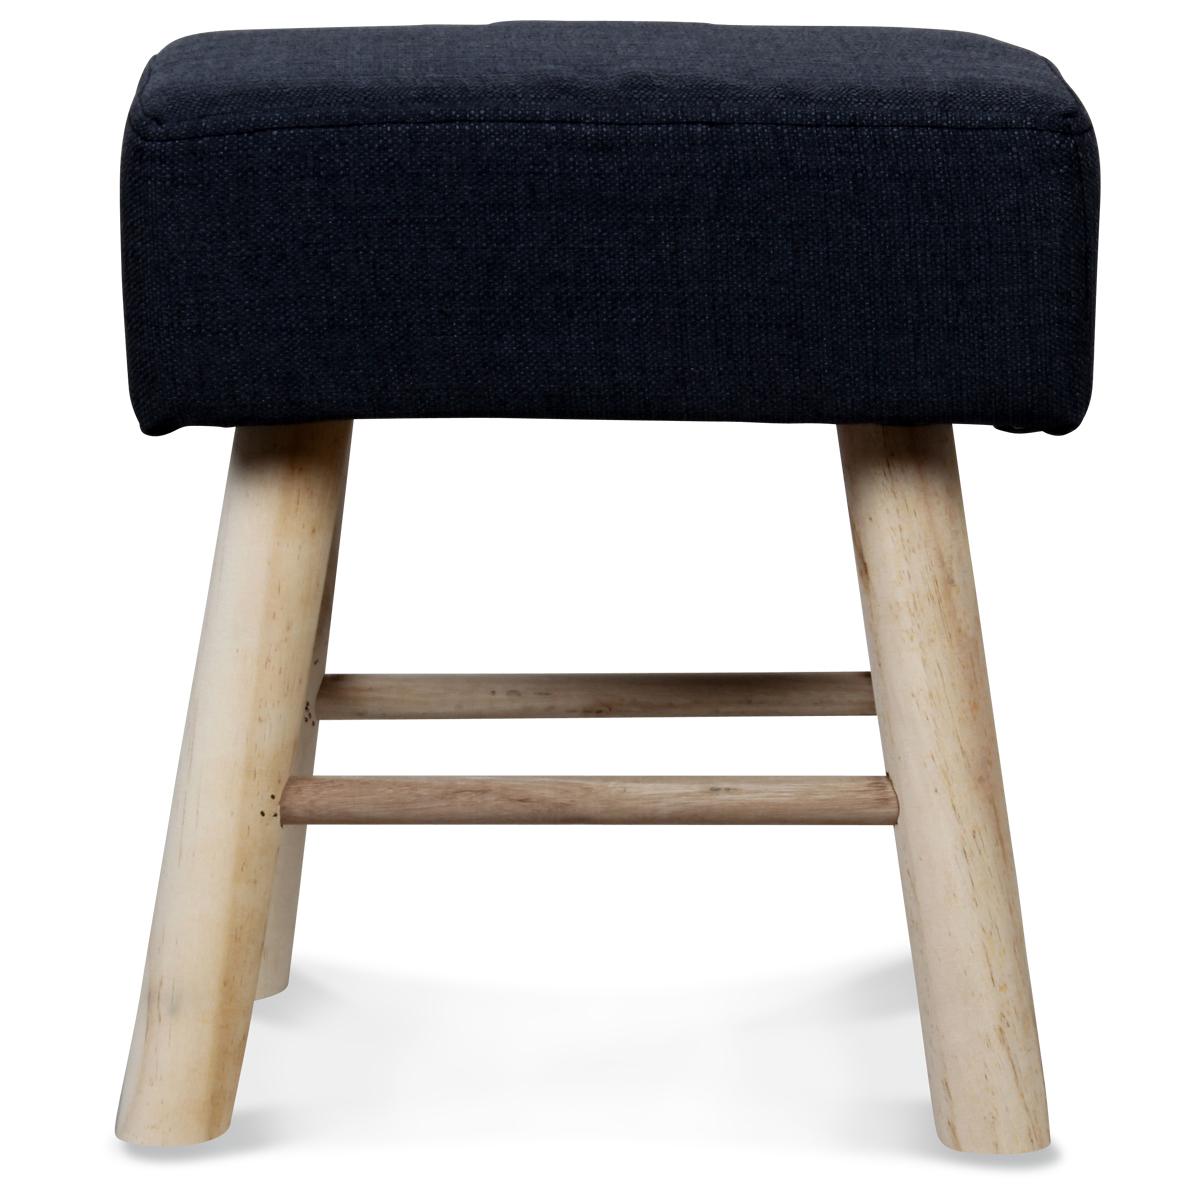 petit tabouret rectangulaire style scandinave en bois gris. Black Bedroom Furniture Sets. Home Design Ideas